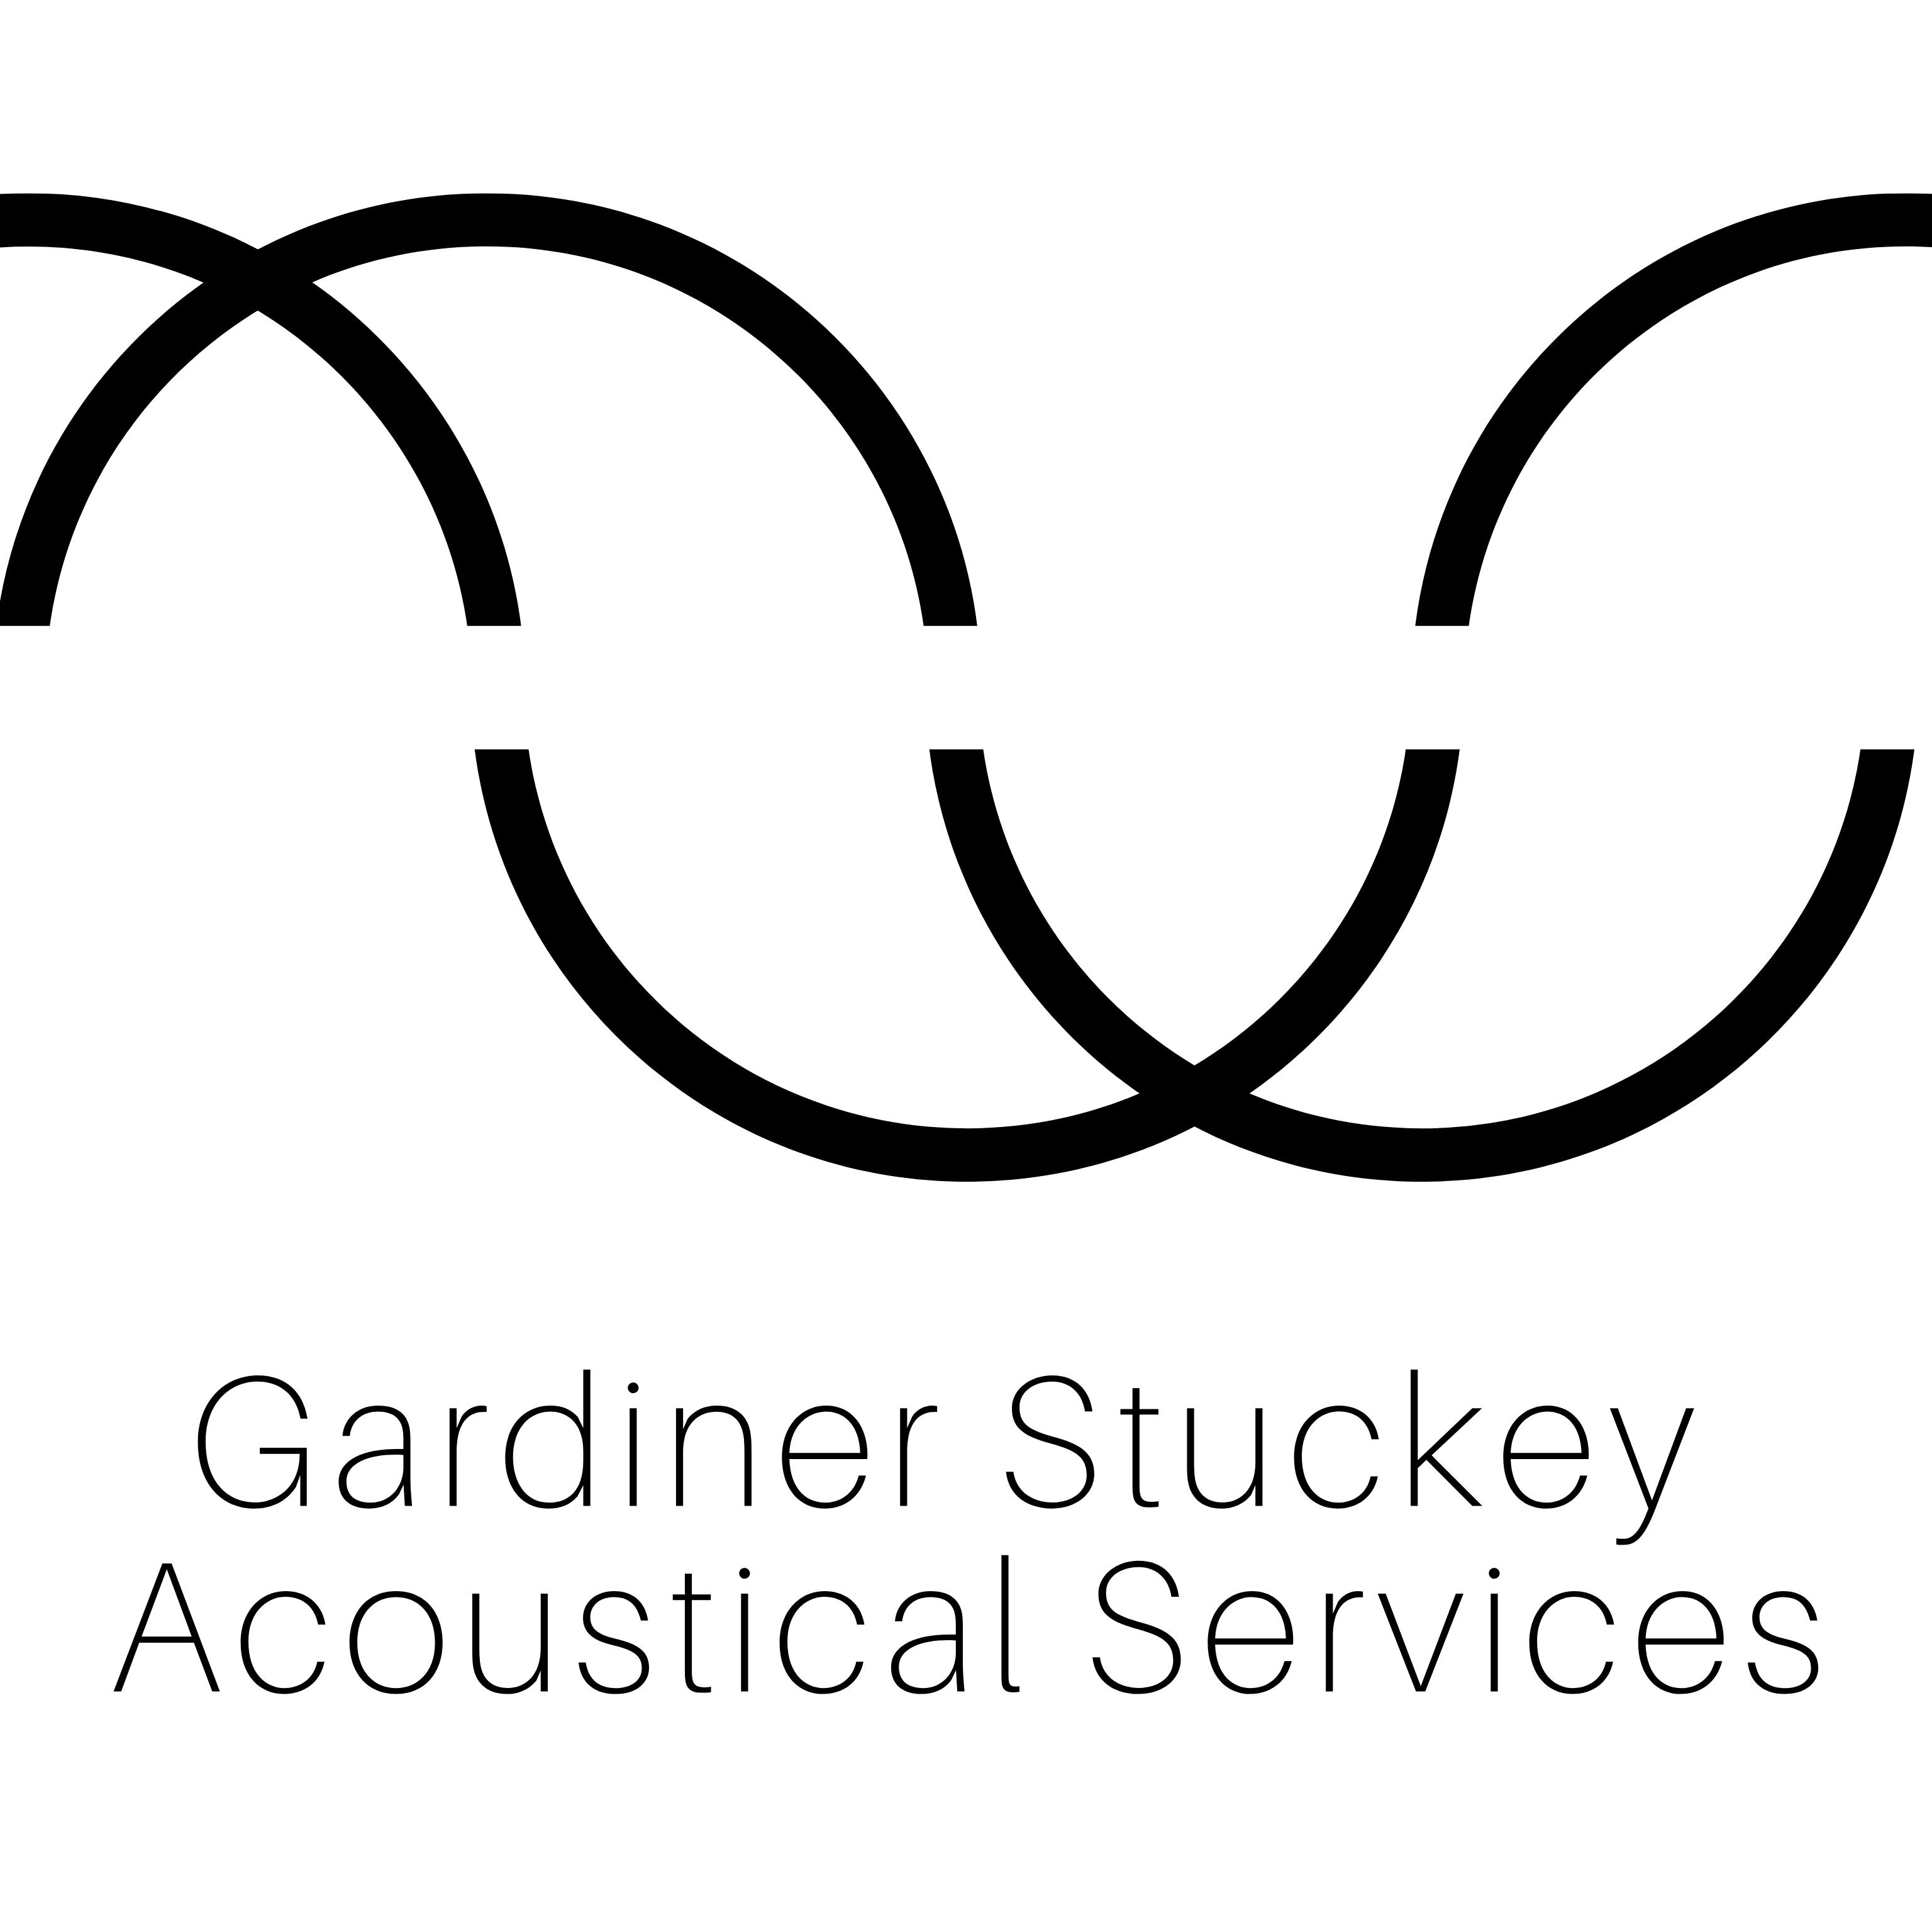 Gardiner Stuckey Acoustical Services